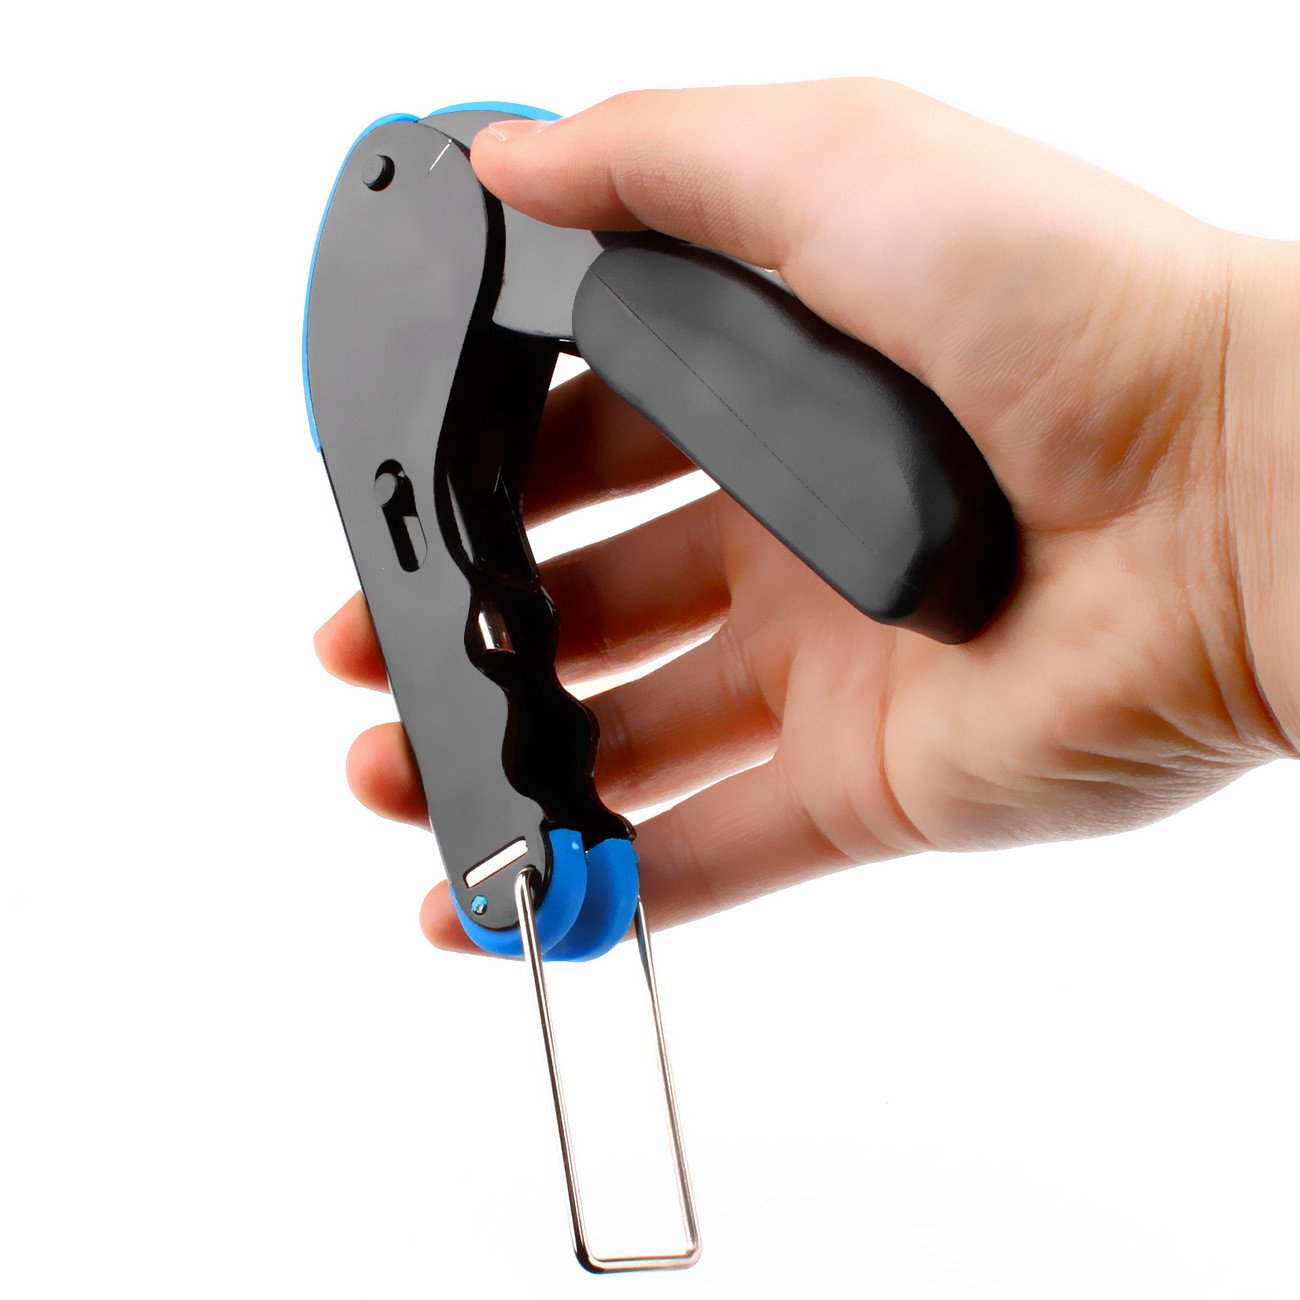 abcGoodefg RG59 RG6 RG11 Coax Compression Crimp Tool Connector Hand Crimper Crimping Tool Waterproof (Blue Tool Set) by abcGoodefg (Image #3)